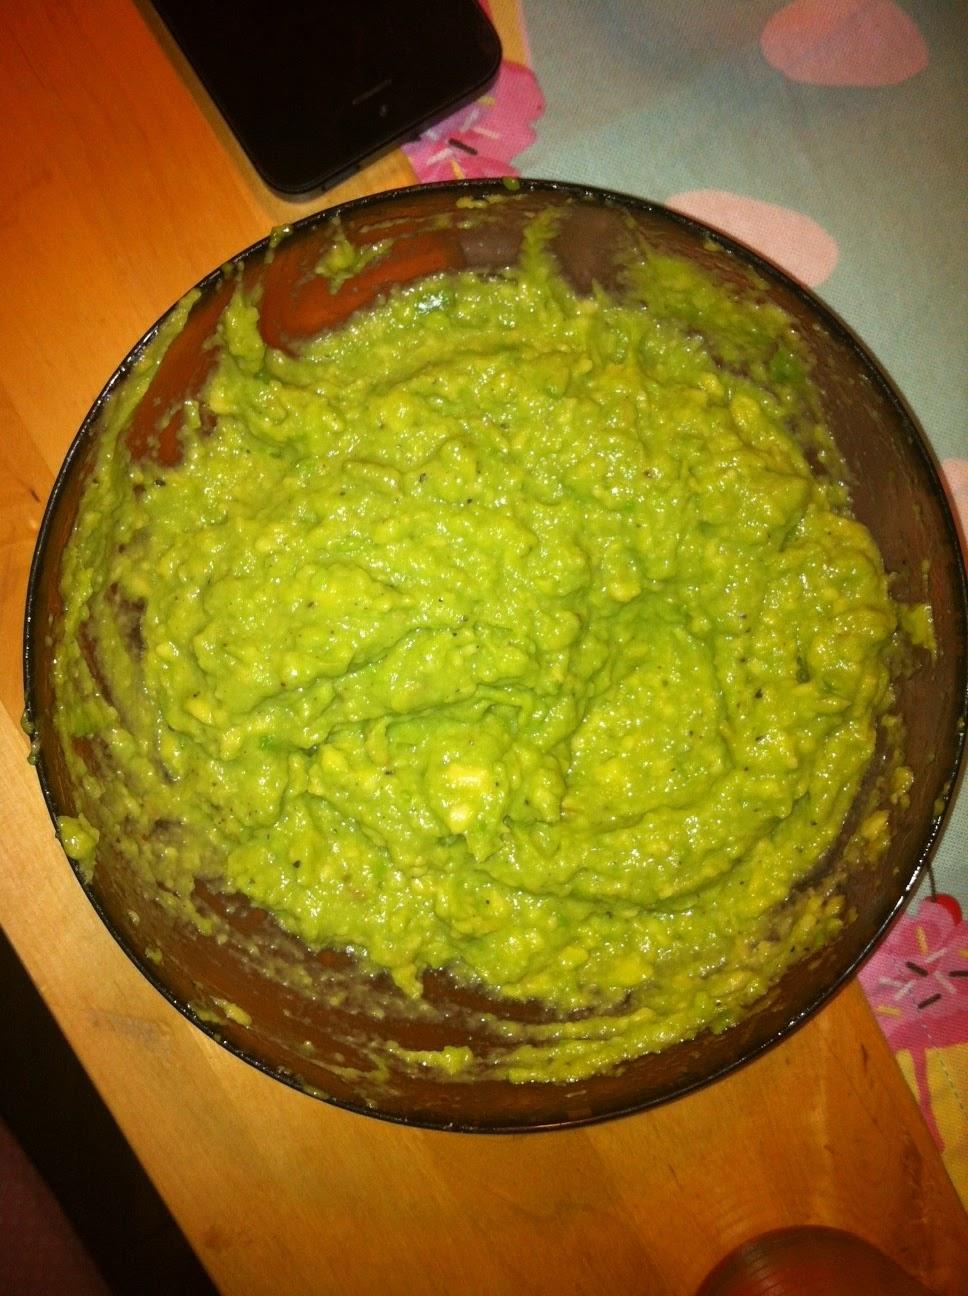 Rezeptidee: Guacamole Dip